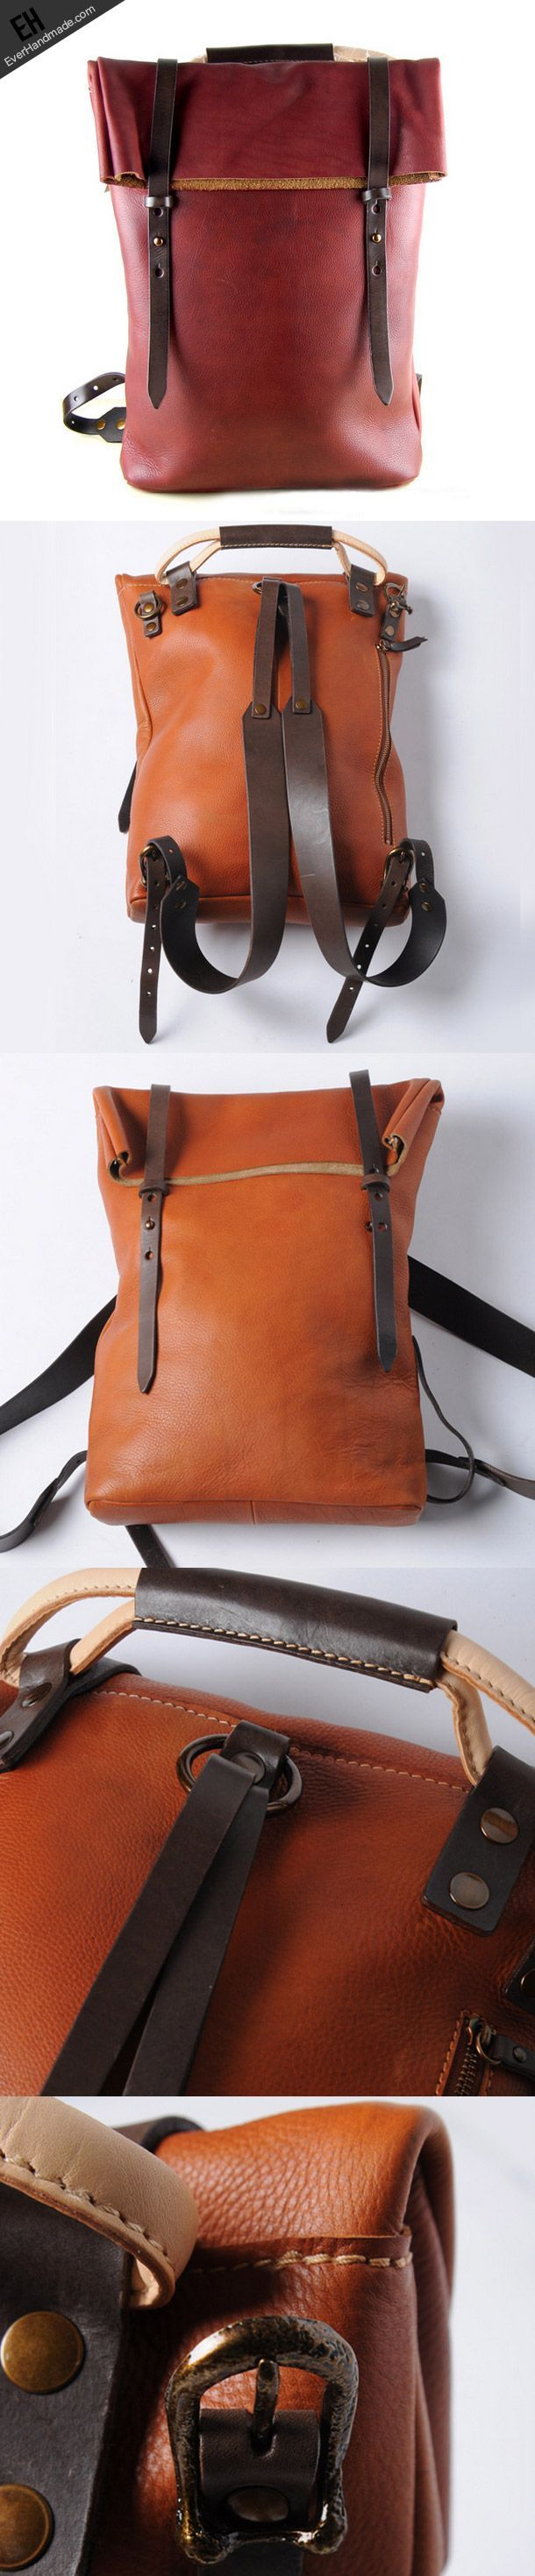 Handmade leather Backpack For men                                                                                                                                                      More - bags with price, bag purchase, purse bag *sponsored https://www.pinterest.com/bags_bag/ https://www.pinterest.com/explore/bags/ https://www.pinterest.com/bags_bag/satchel-bag/ http://www.ebay.com/rpp/handbags